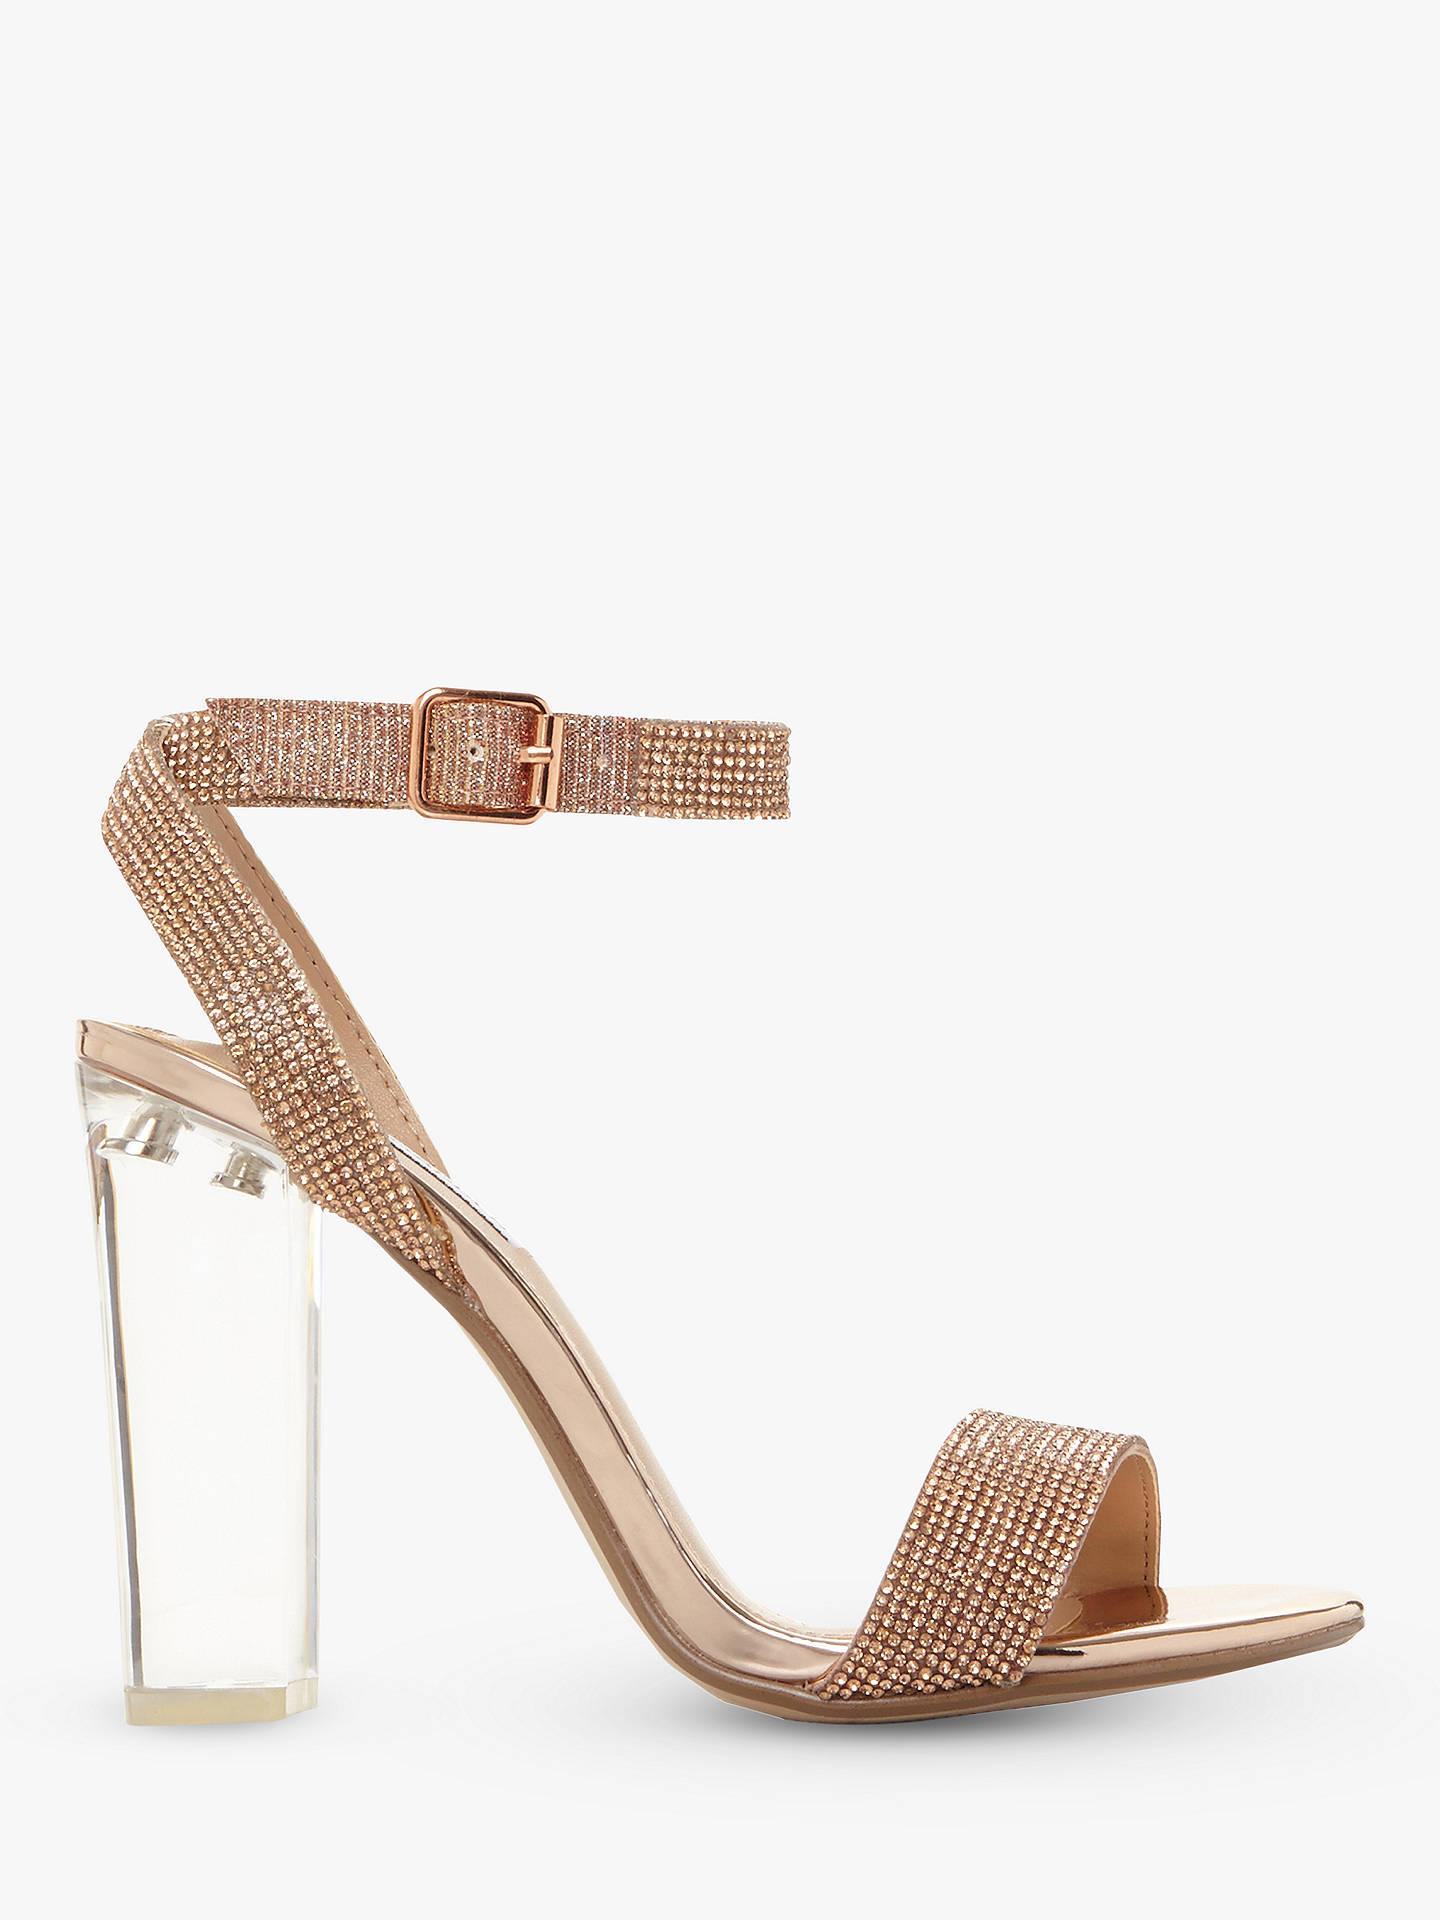 5fef2e39921 Steve Madden Crysler Crystal High Block Heel Sandals at John Lewis ...